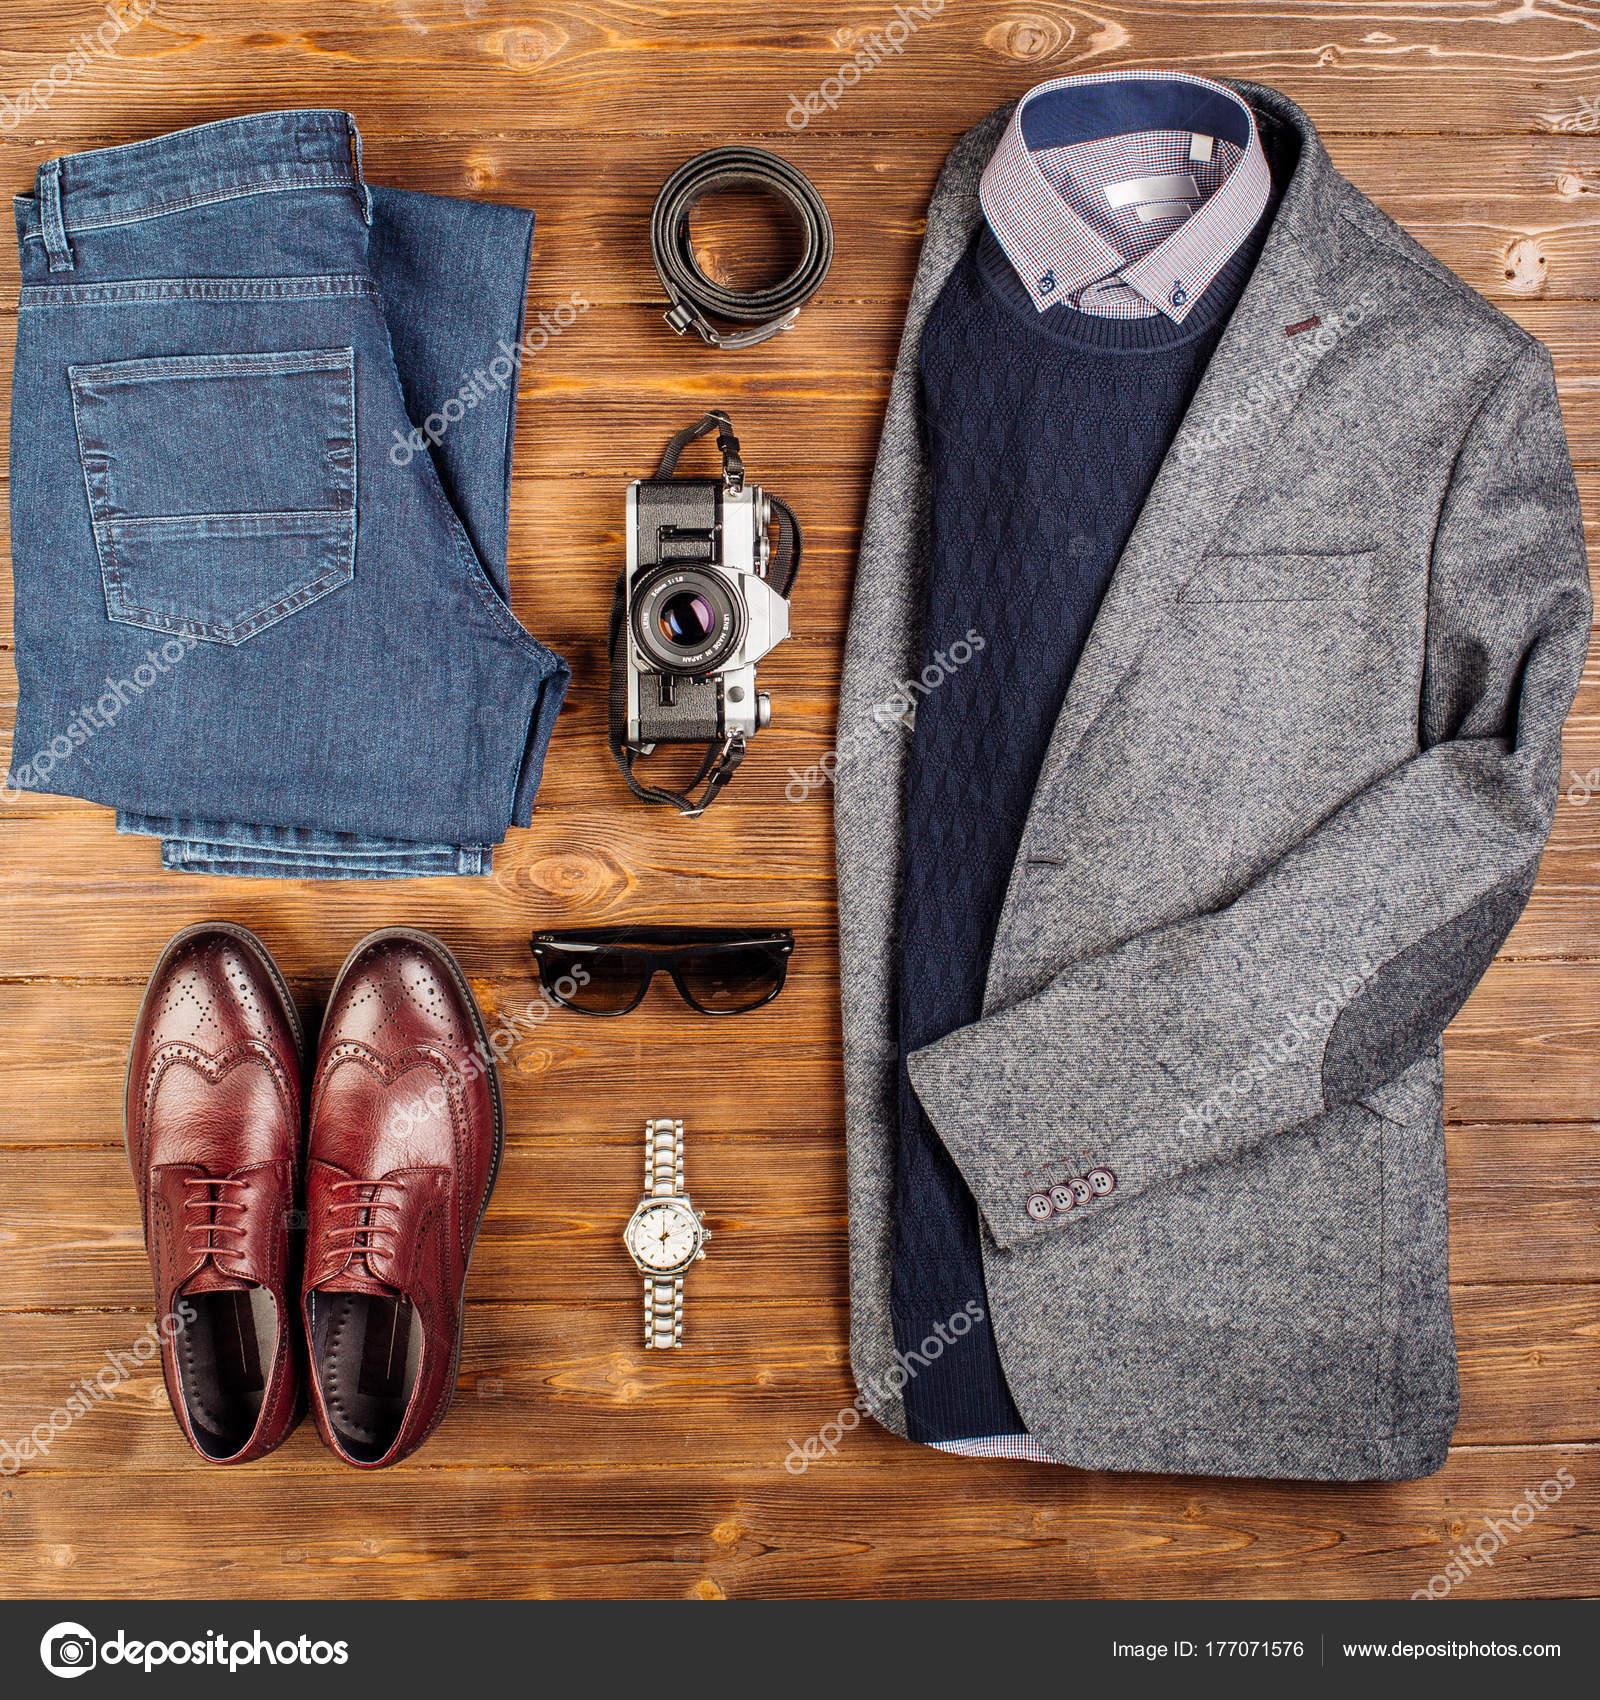 b4cde68b9085a Conjunto de moda de lujo para hombres  chaqueta